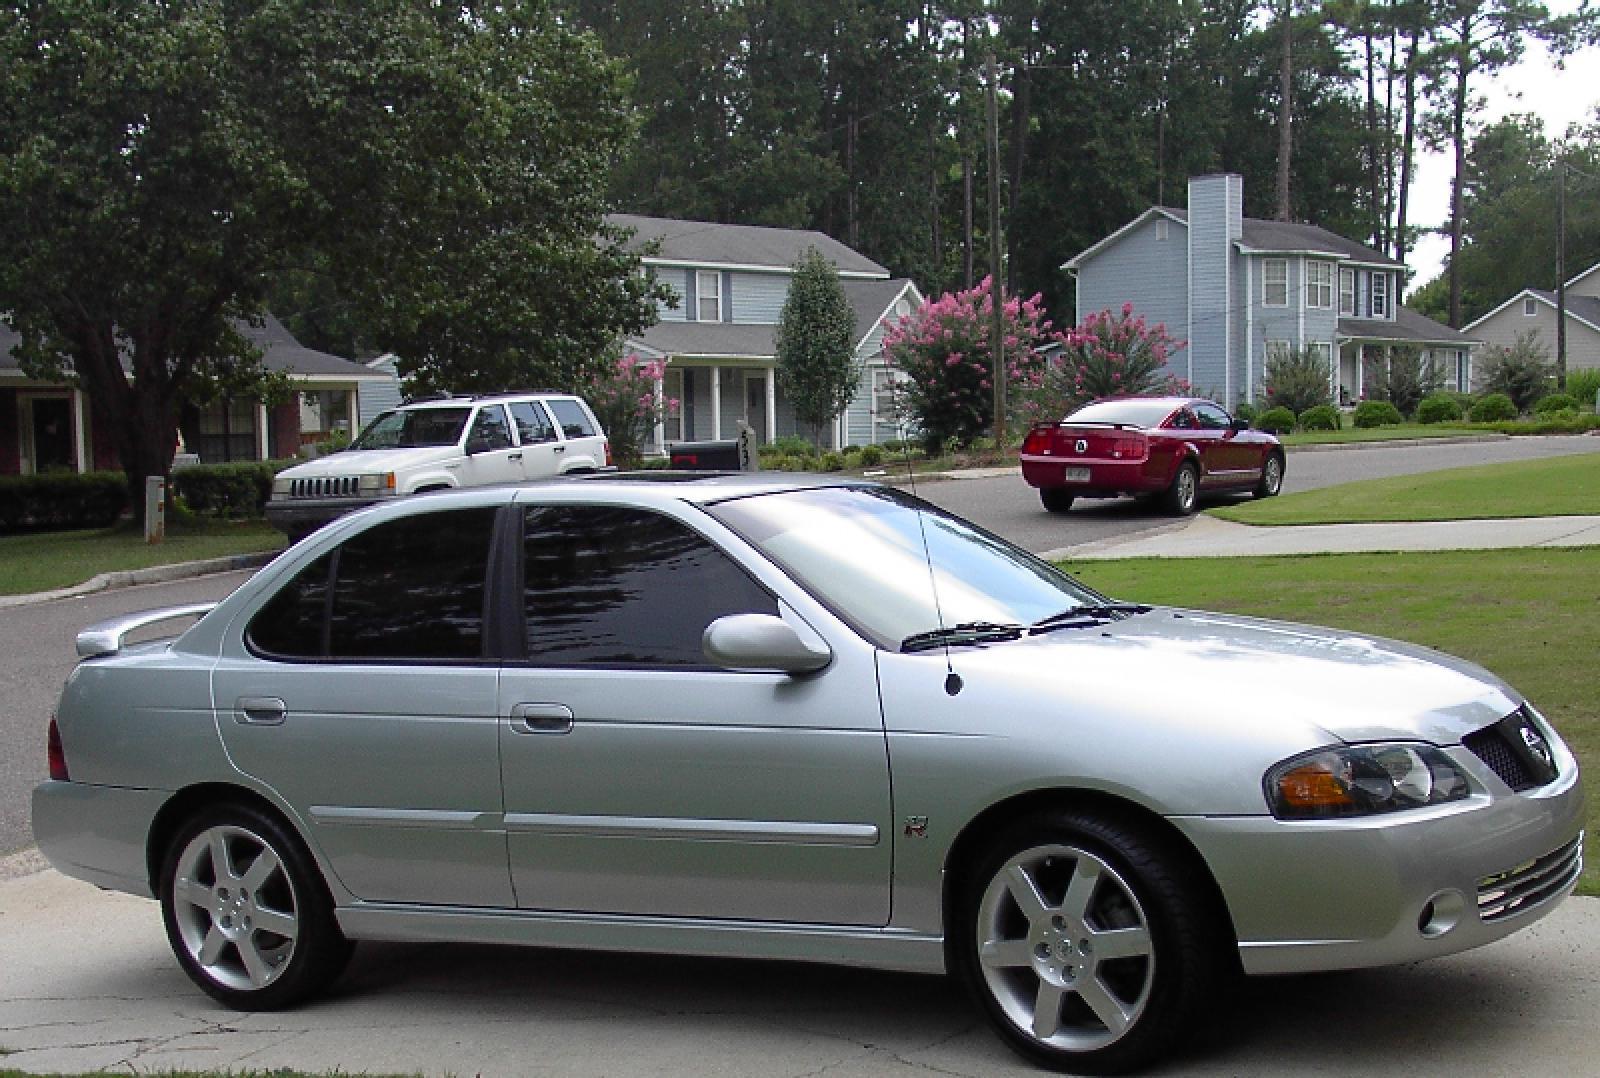 2004 Nissan Sentra - Information and photos - Zomb Drive